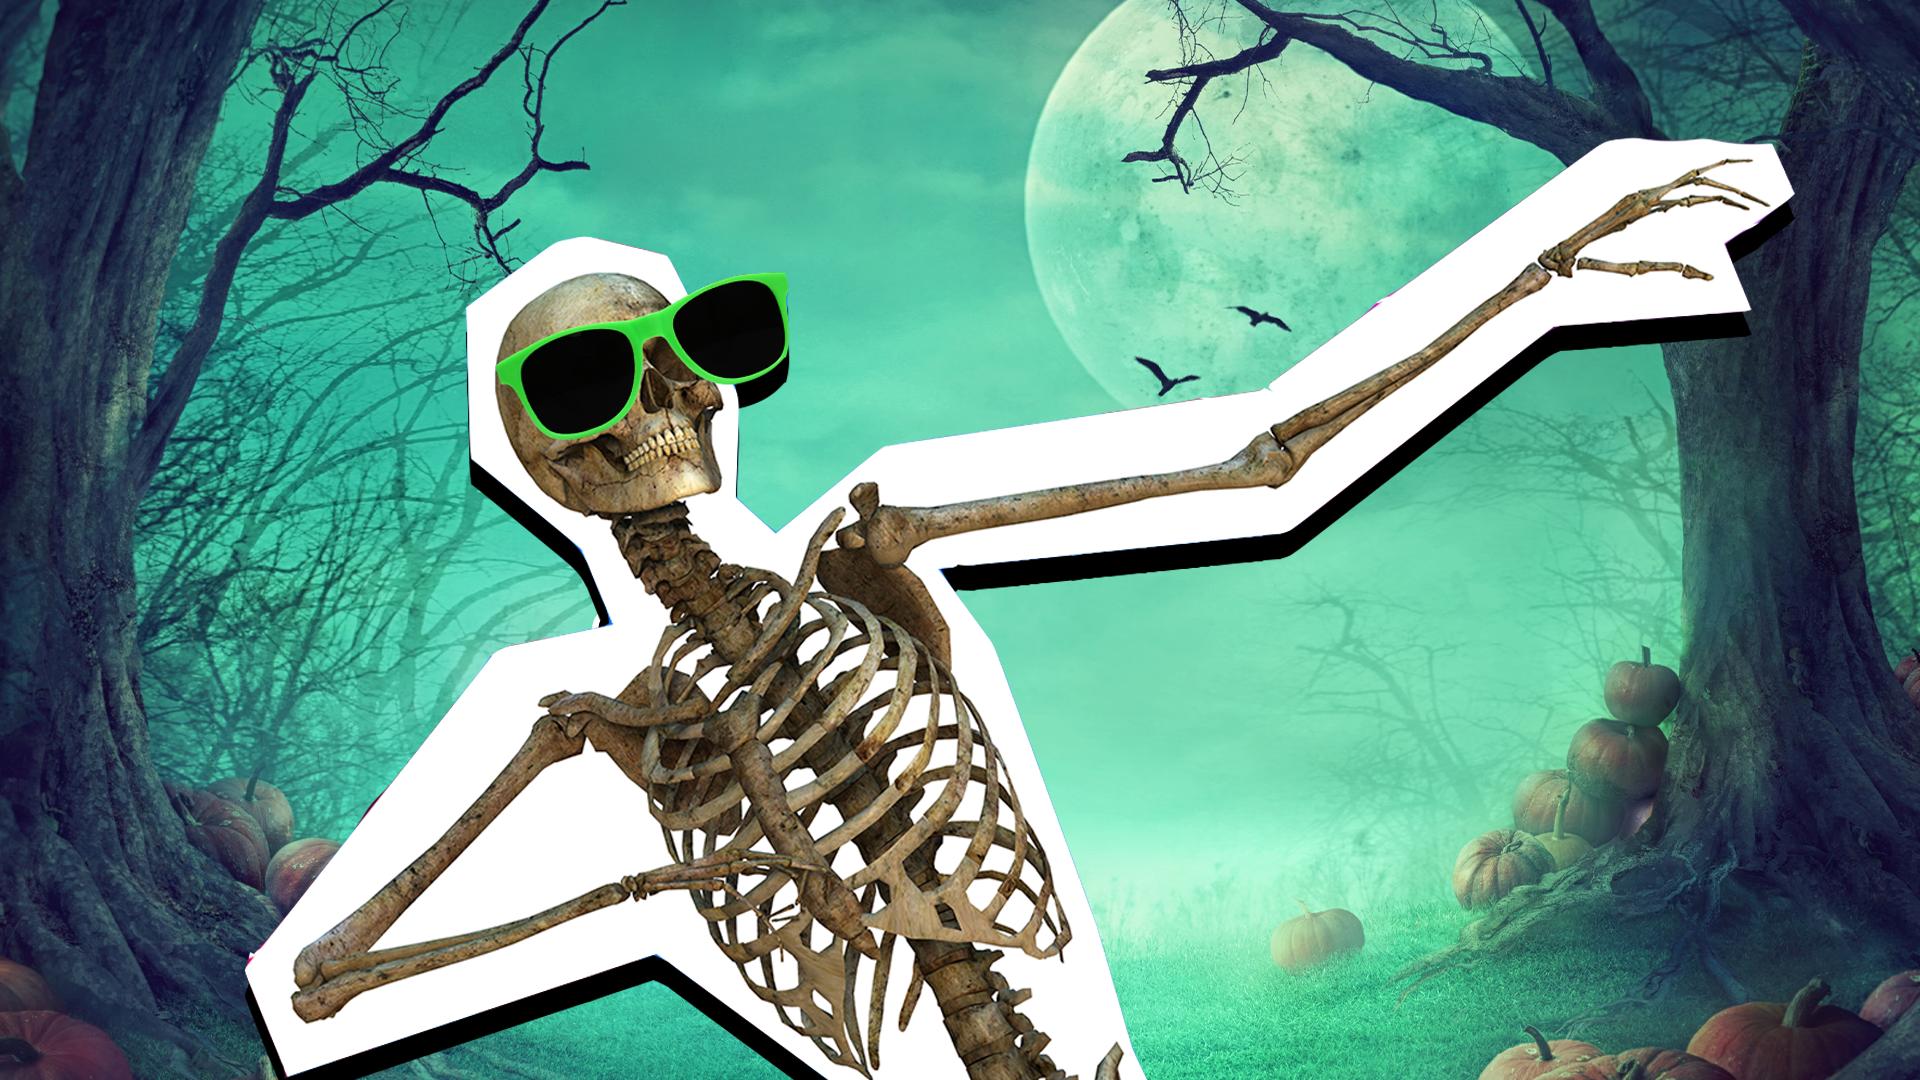 Grinning skeleton wearing green sunglasses doing the Dab Fortnite dance